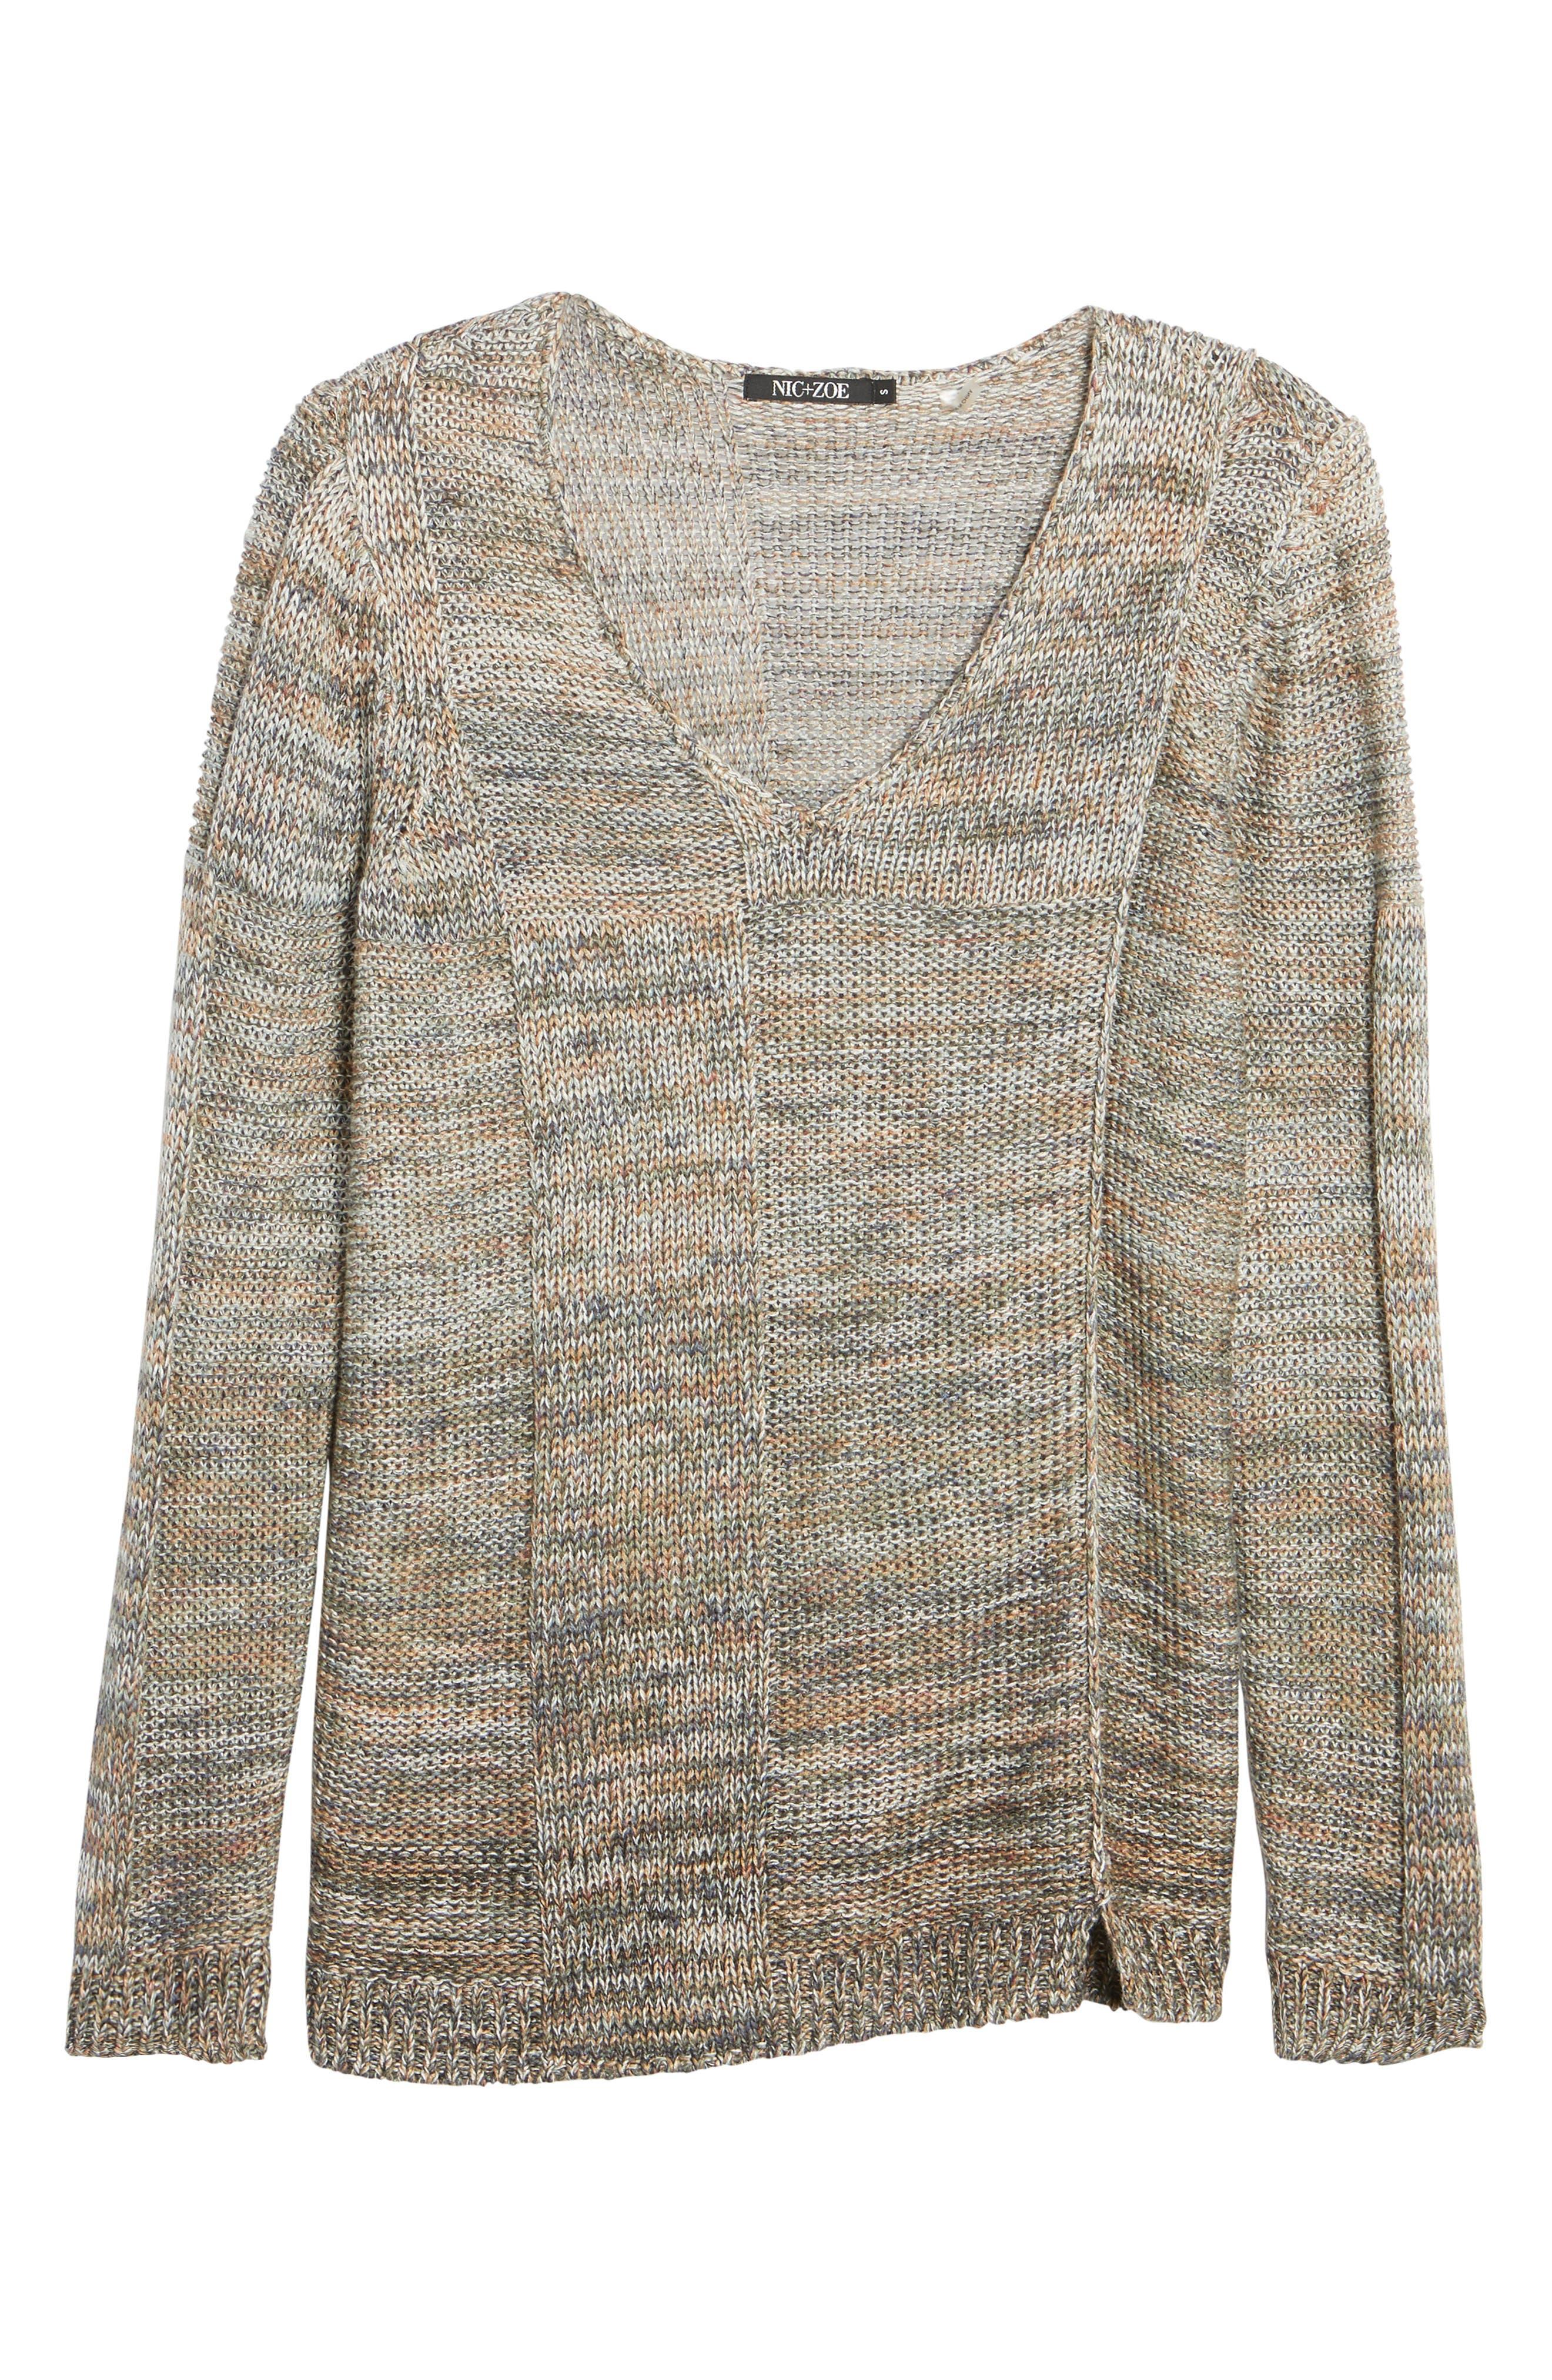 Textured Ombré Sweater,                             Alternate thumbnail 6, color,                             Multi